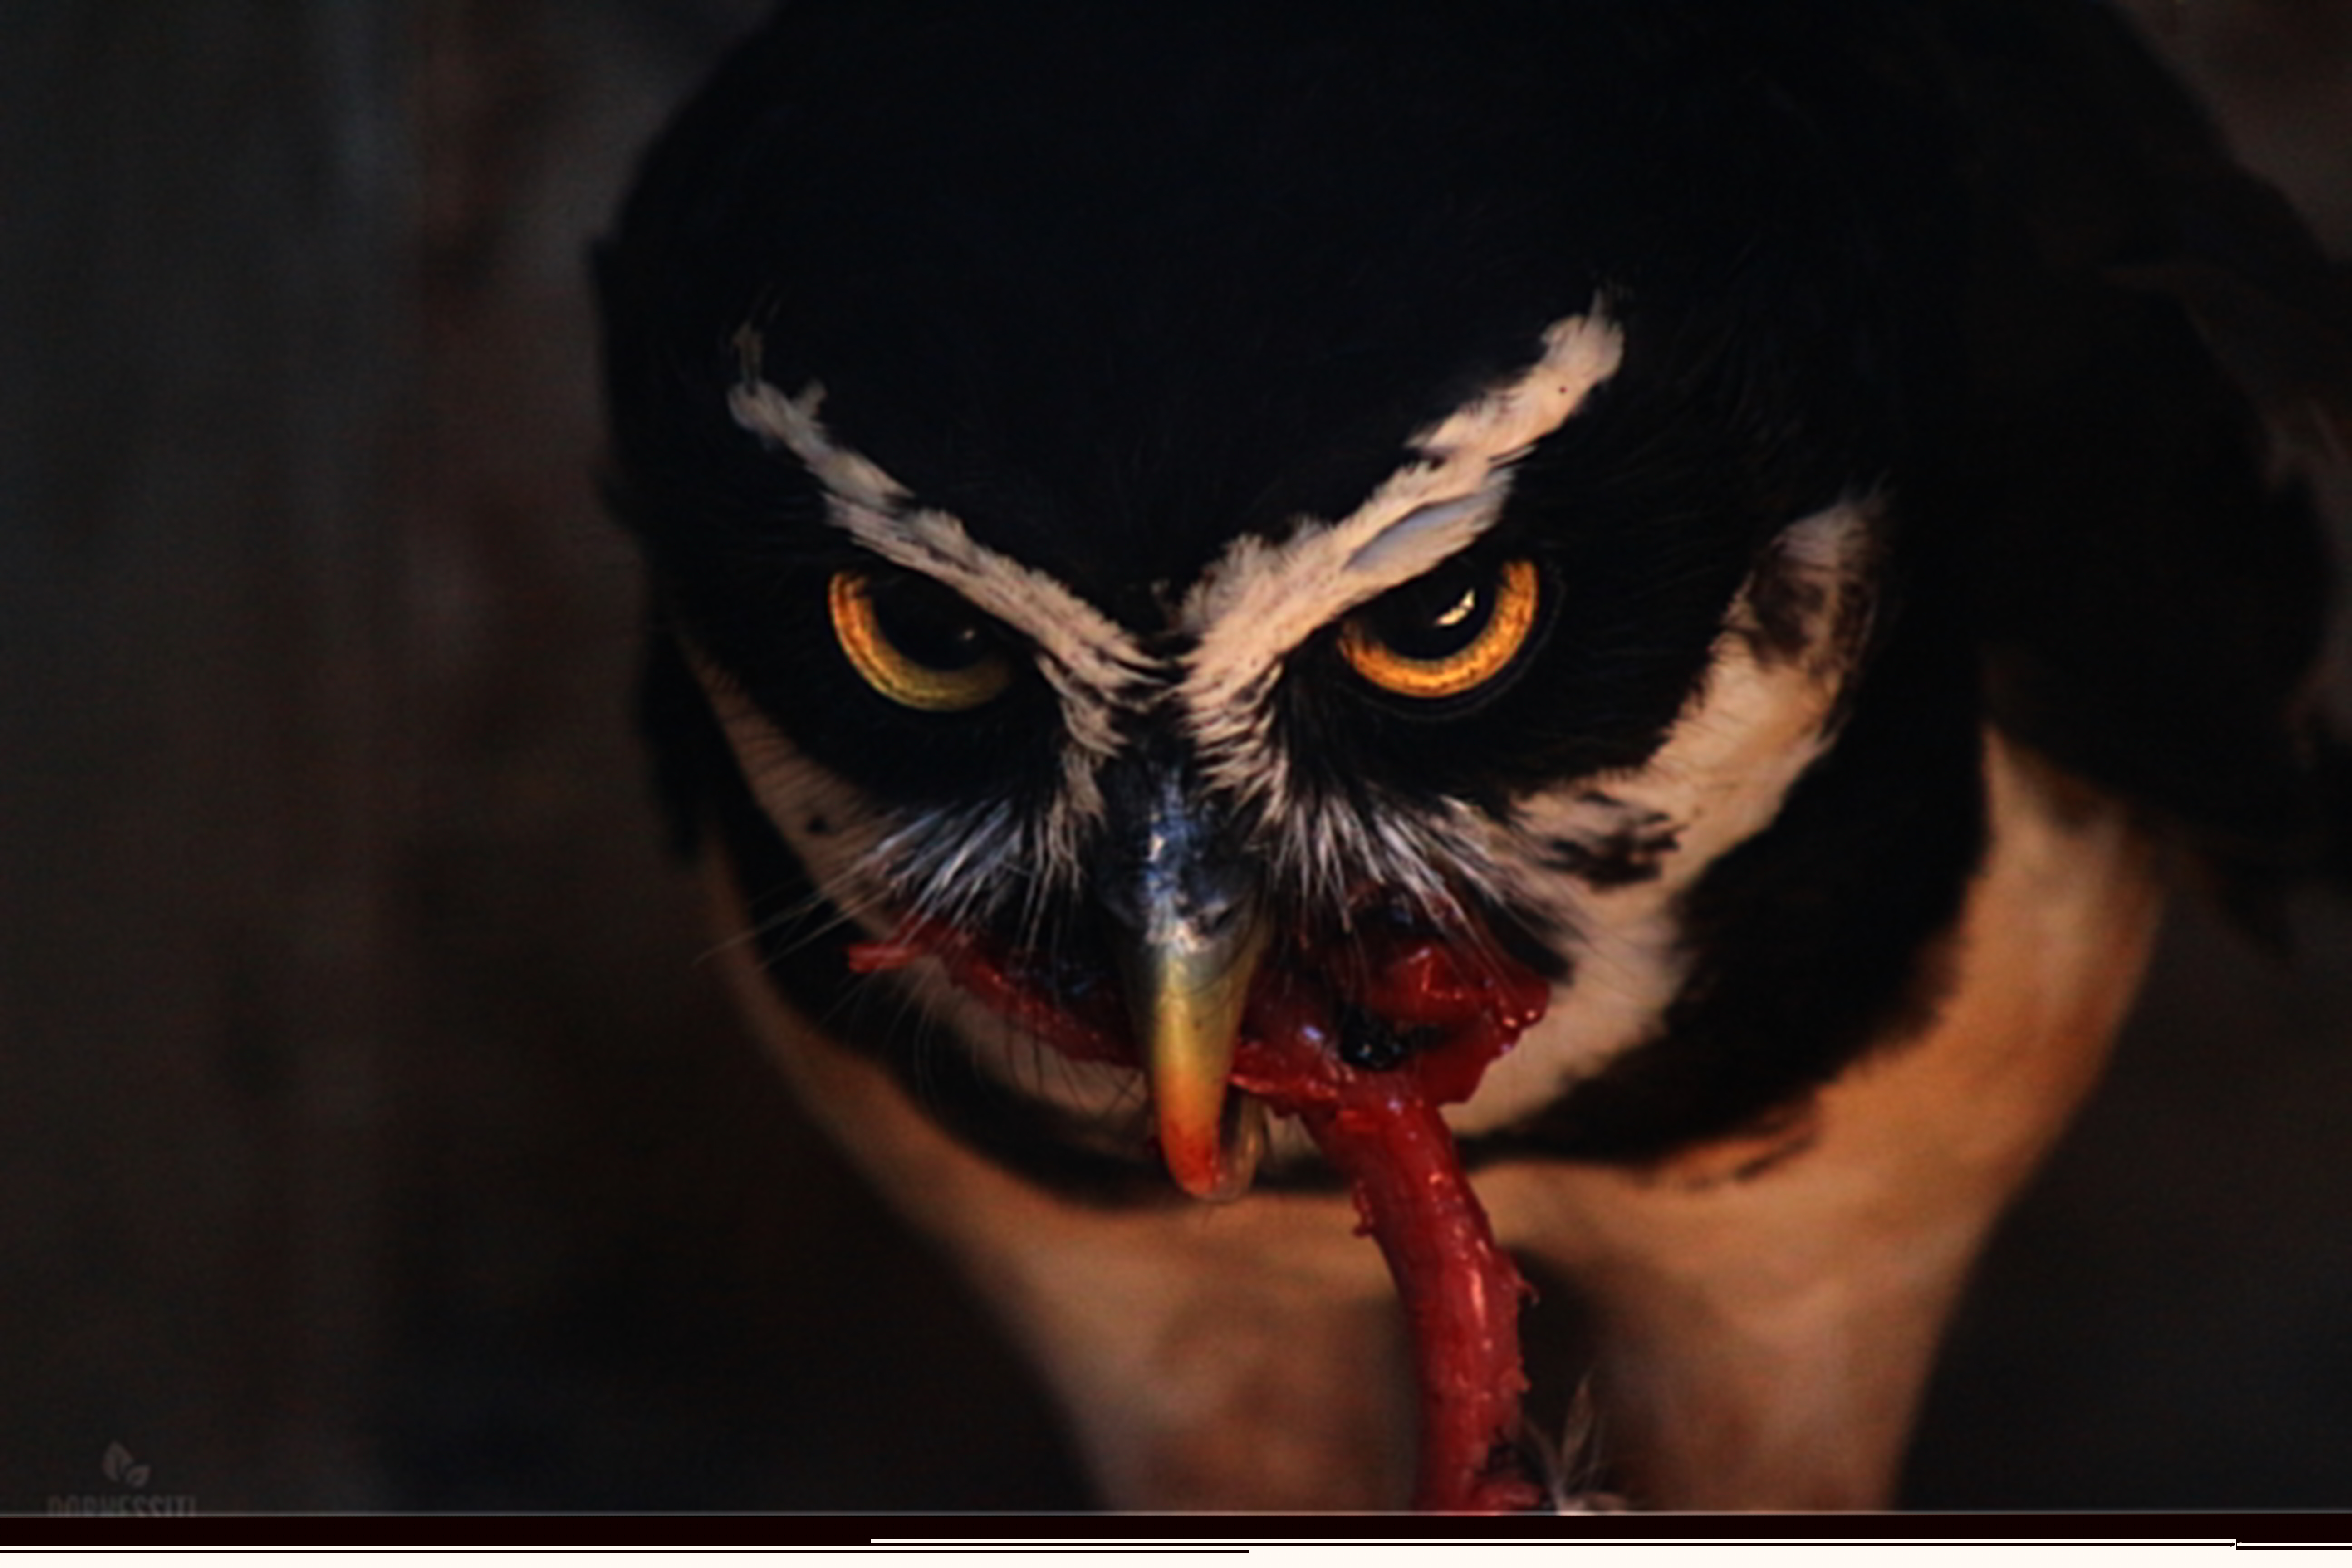 owl eating